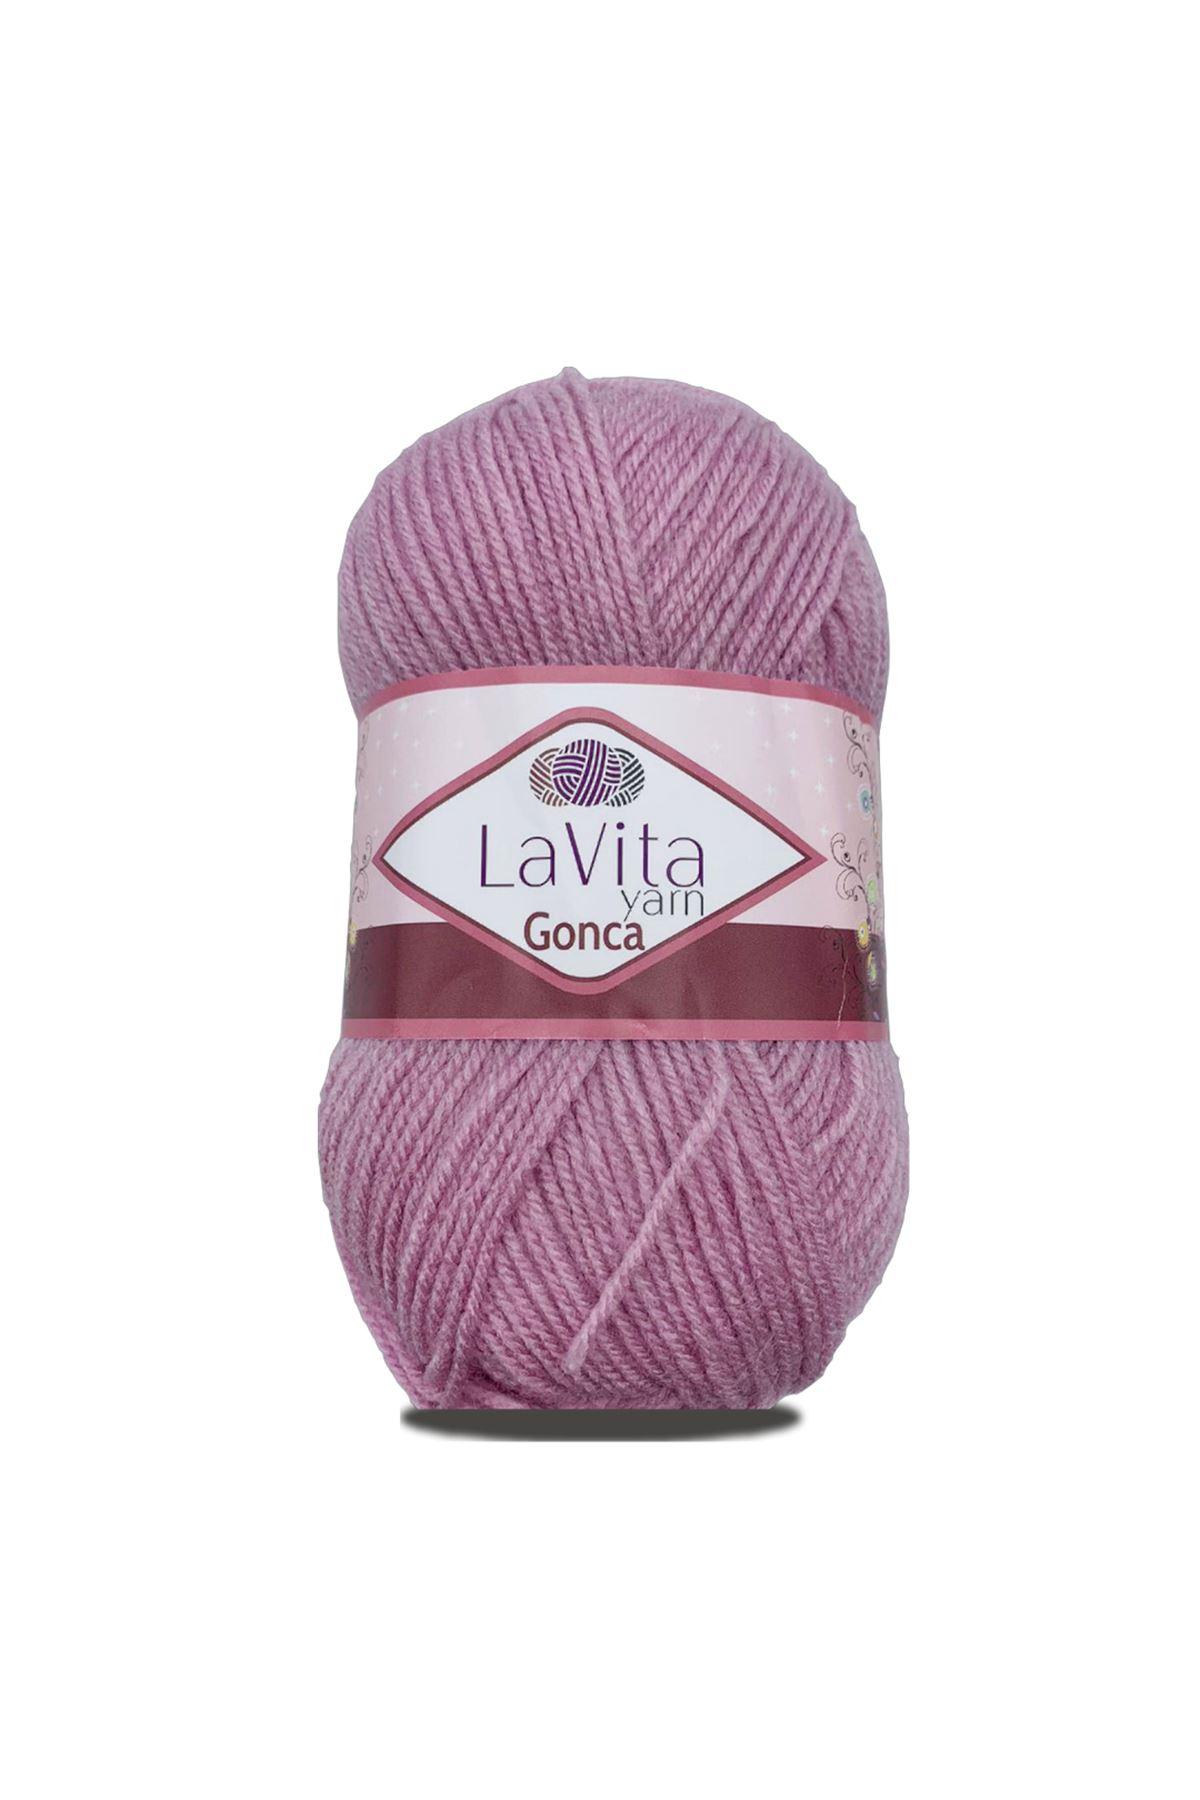 Lavita Gonca 4120 Koyu Lila